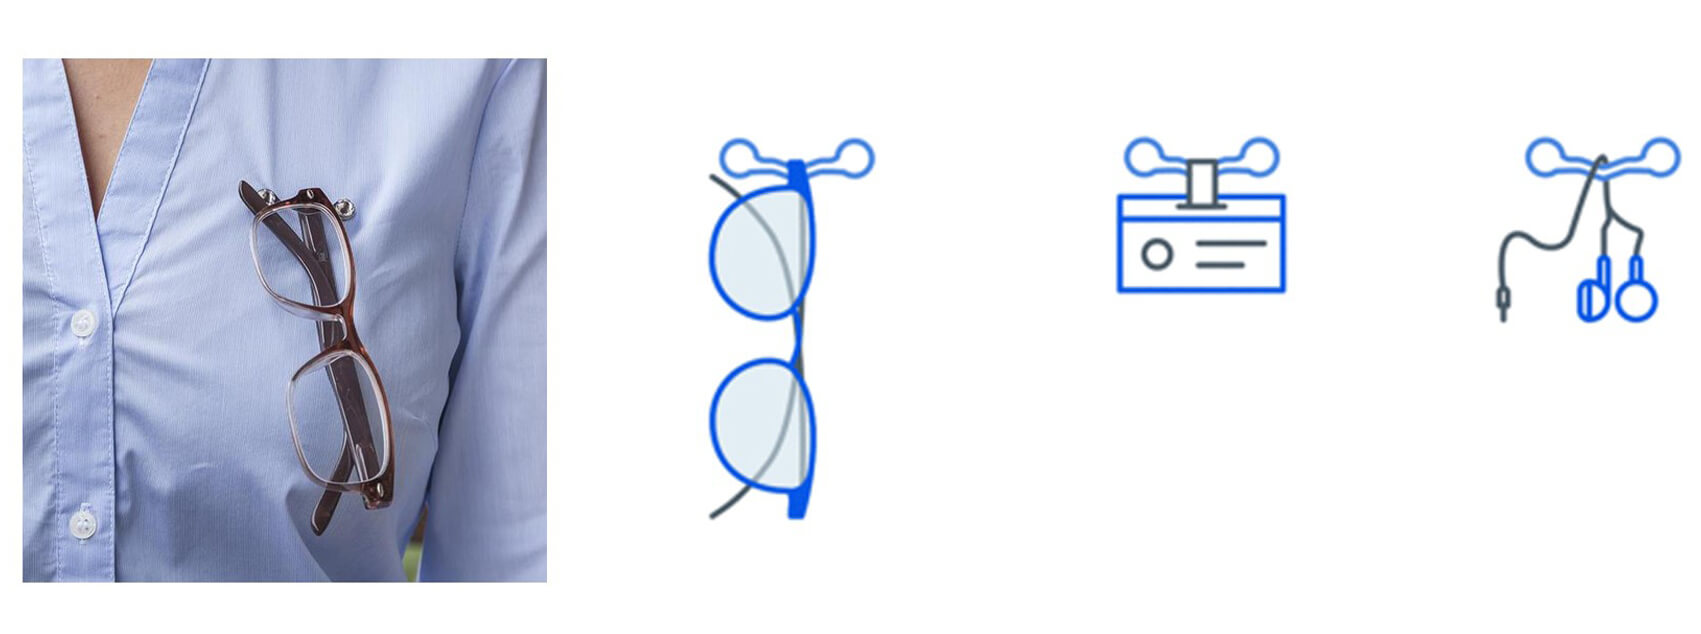 Soportes magnéticos para anteojos-1